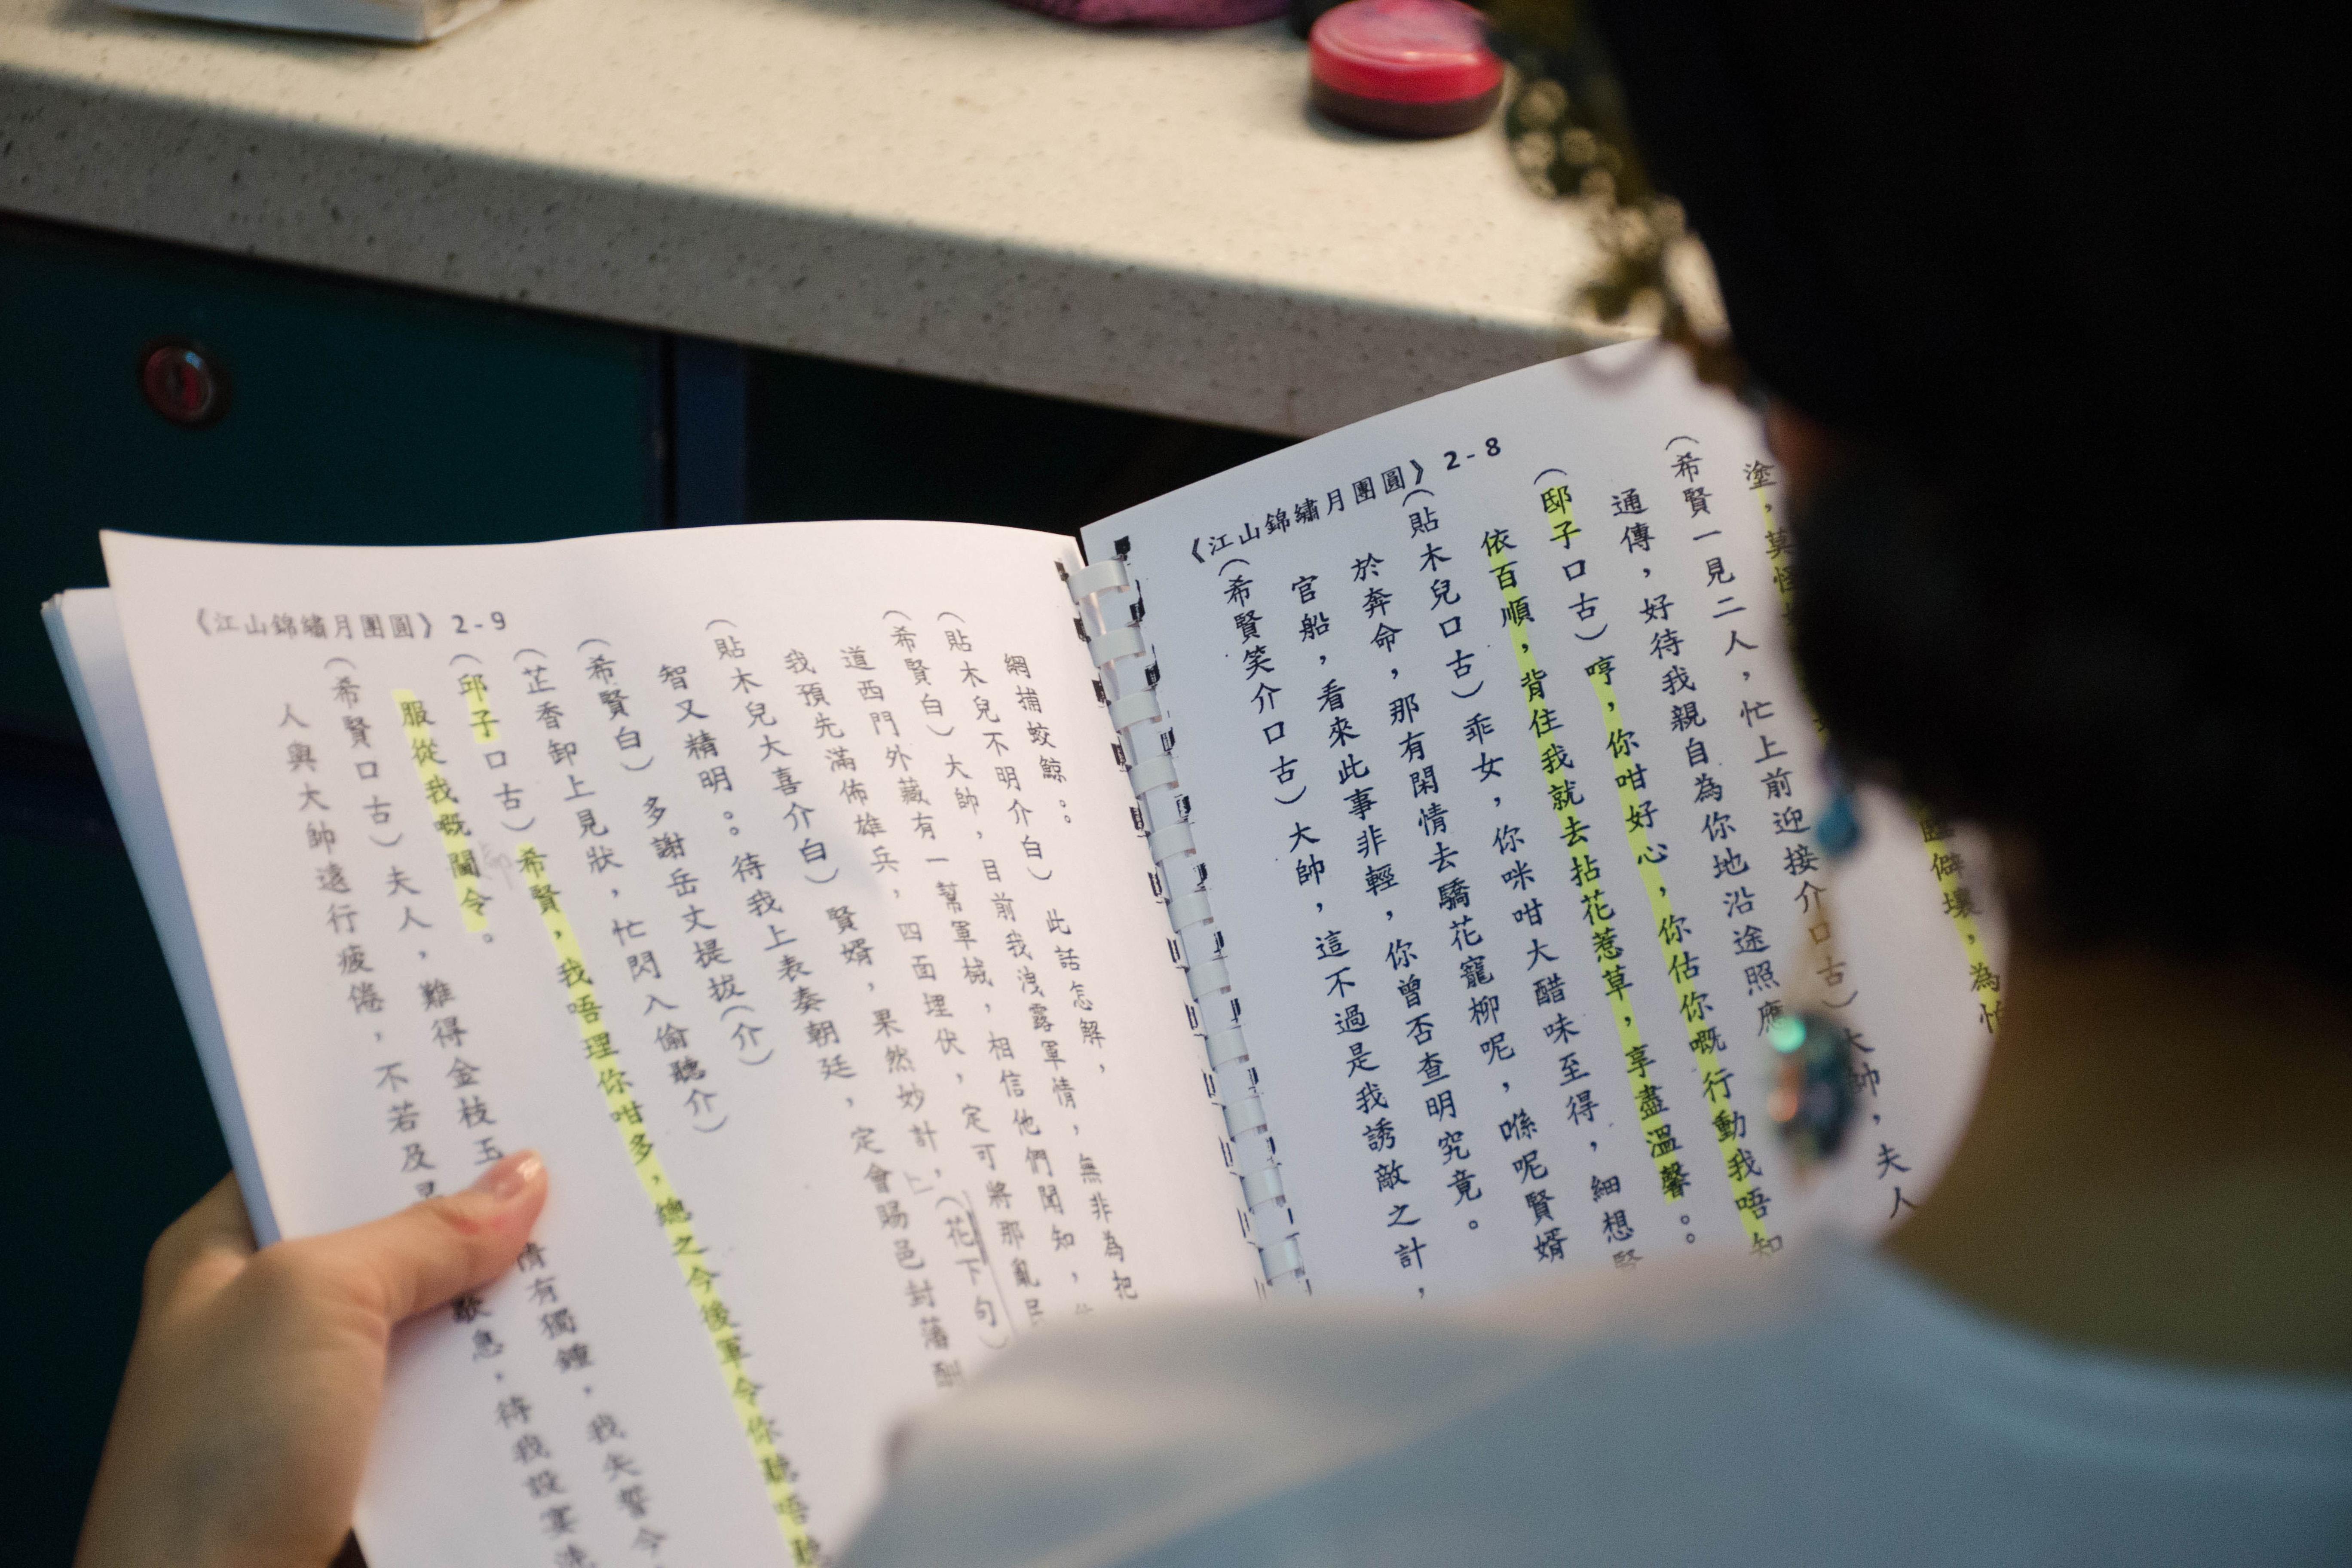 http://ubeat.com.cuhk.edu.hk/wp-content/uploads/2018/136_culture_14-2.jpg